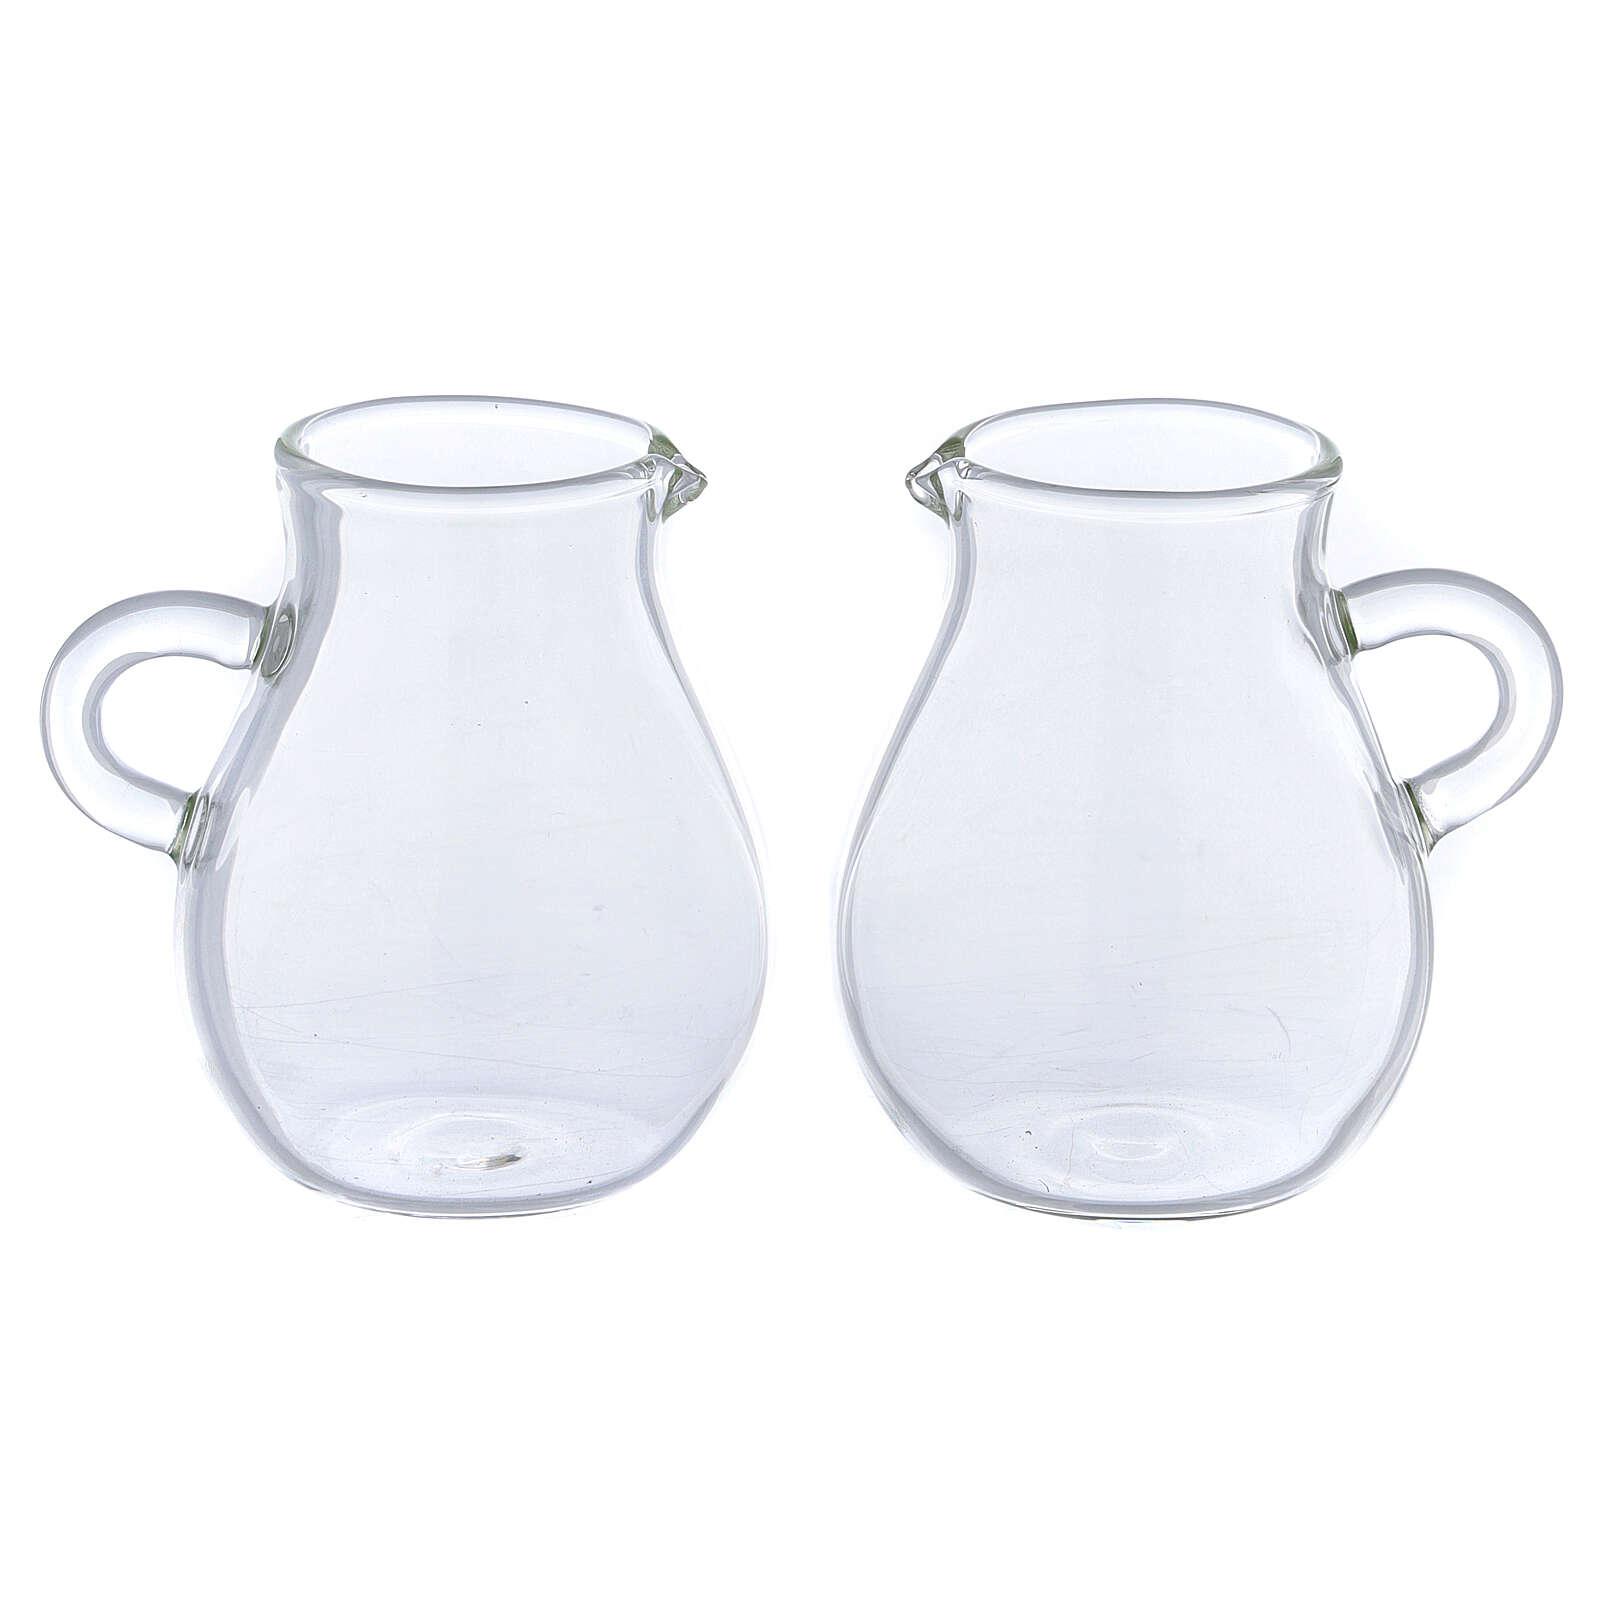 Round ewer in glass 110 ml, 2 pcs 4